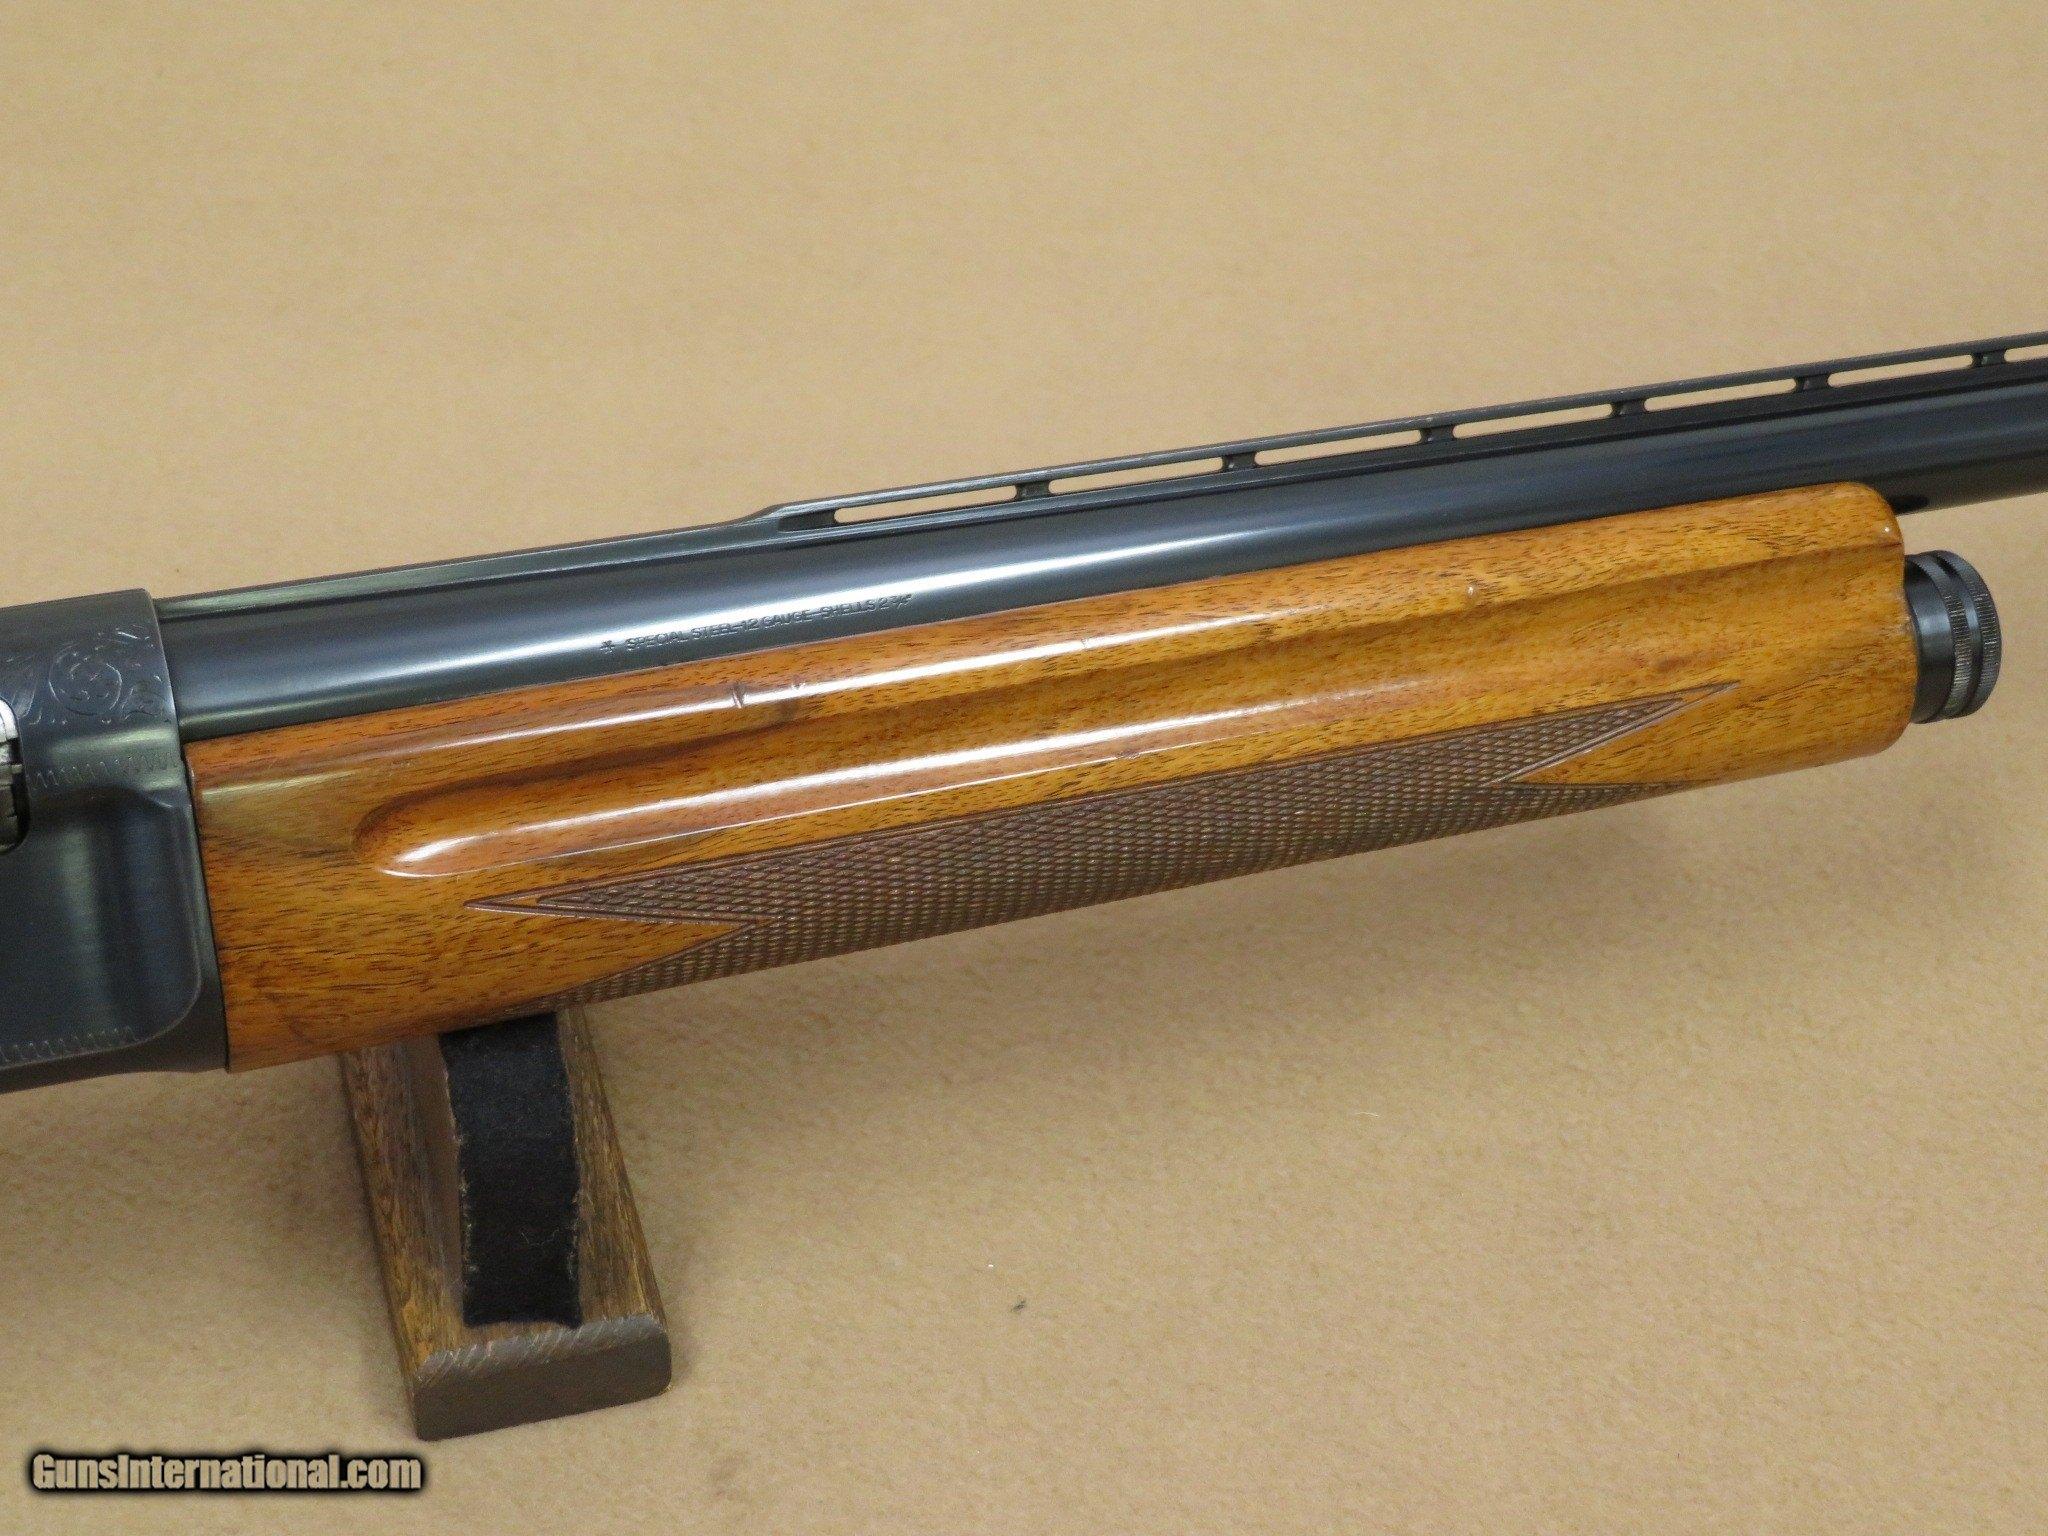 1965 Belgian Browning A5 Light Twelve 12 Ga  Shotgun 30